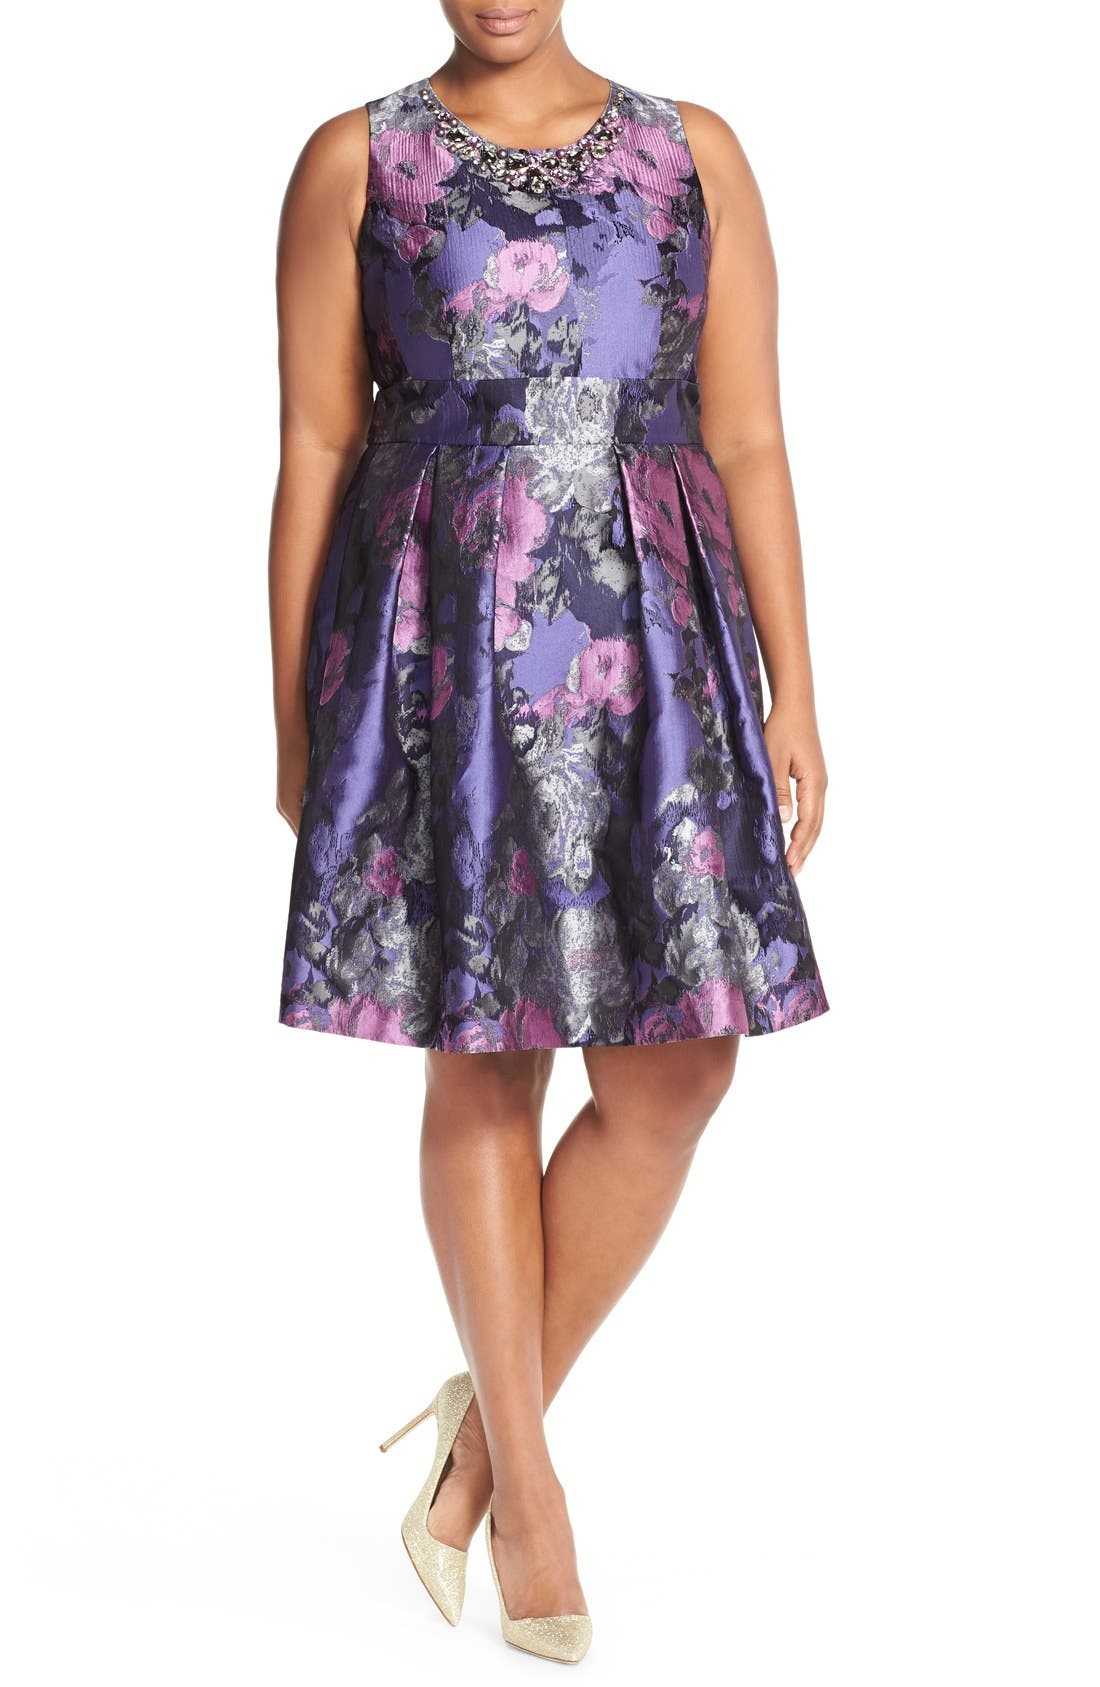 ELIZA J, Embellished Neck Metallic Jacquard Fit & Flare Dress, Alternate thumbnail 3, color, 523